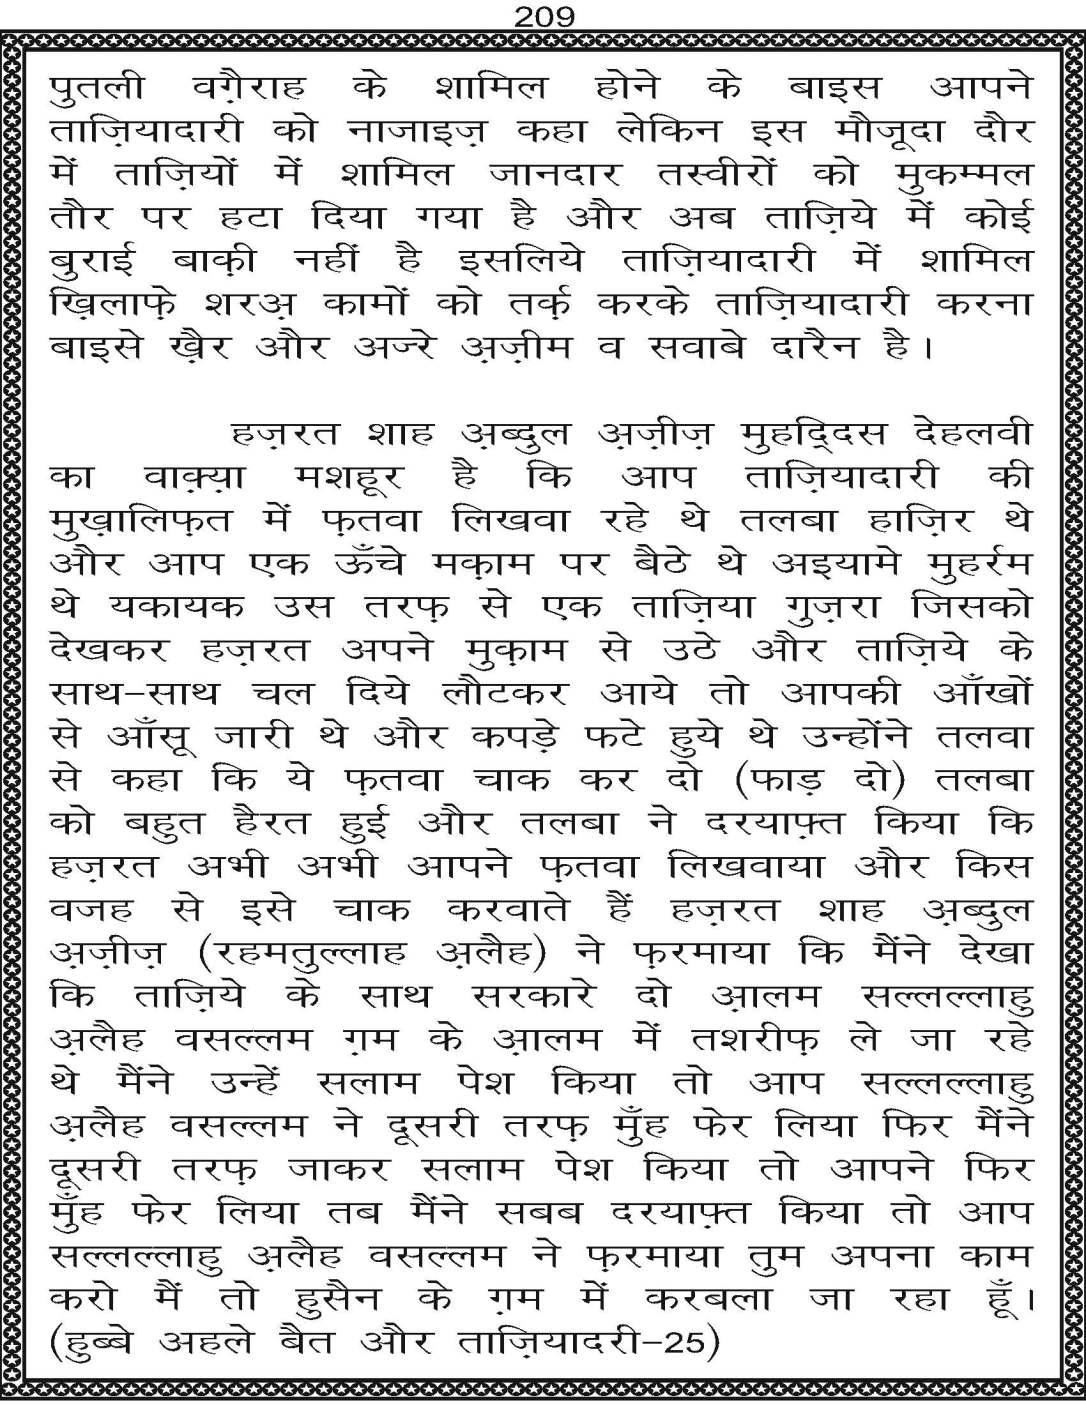 AzmateTaziyadari_Page_209